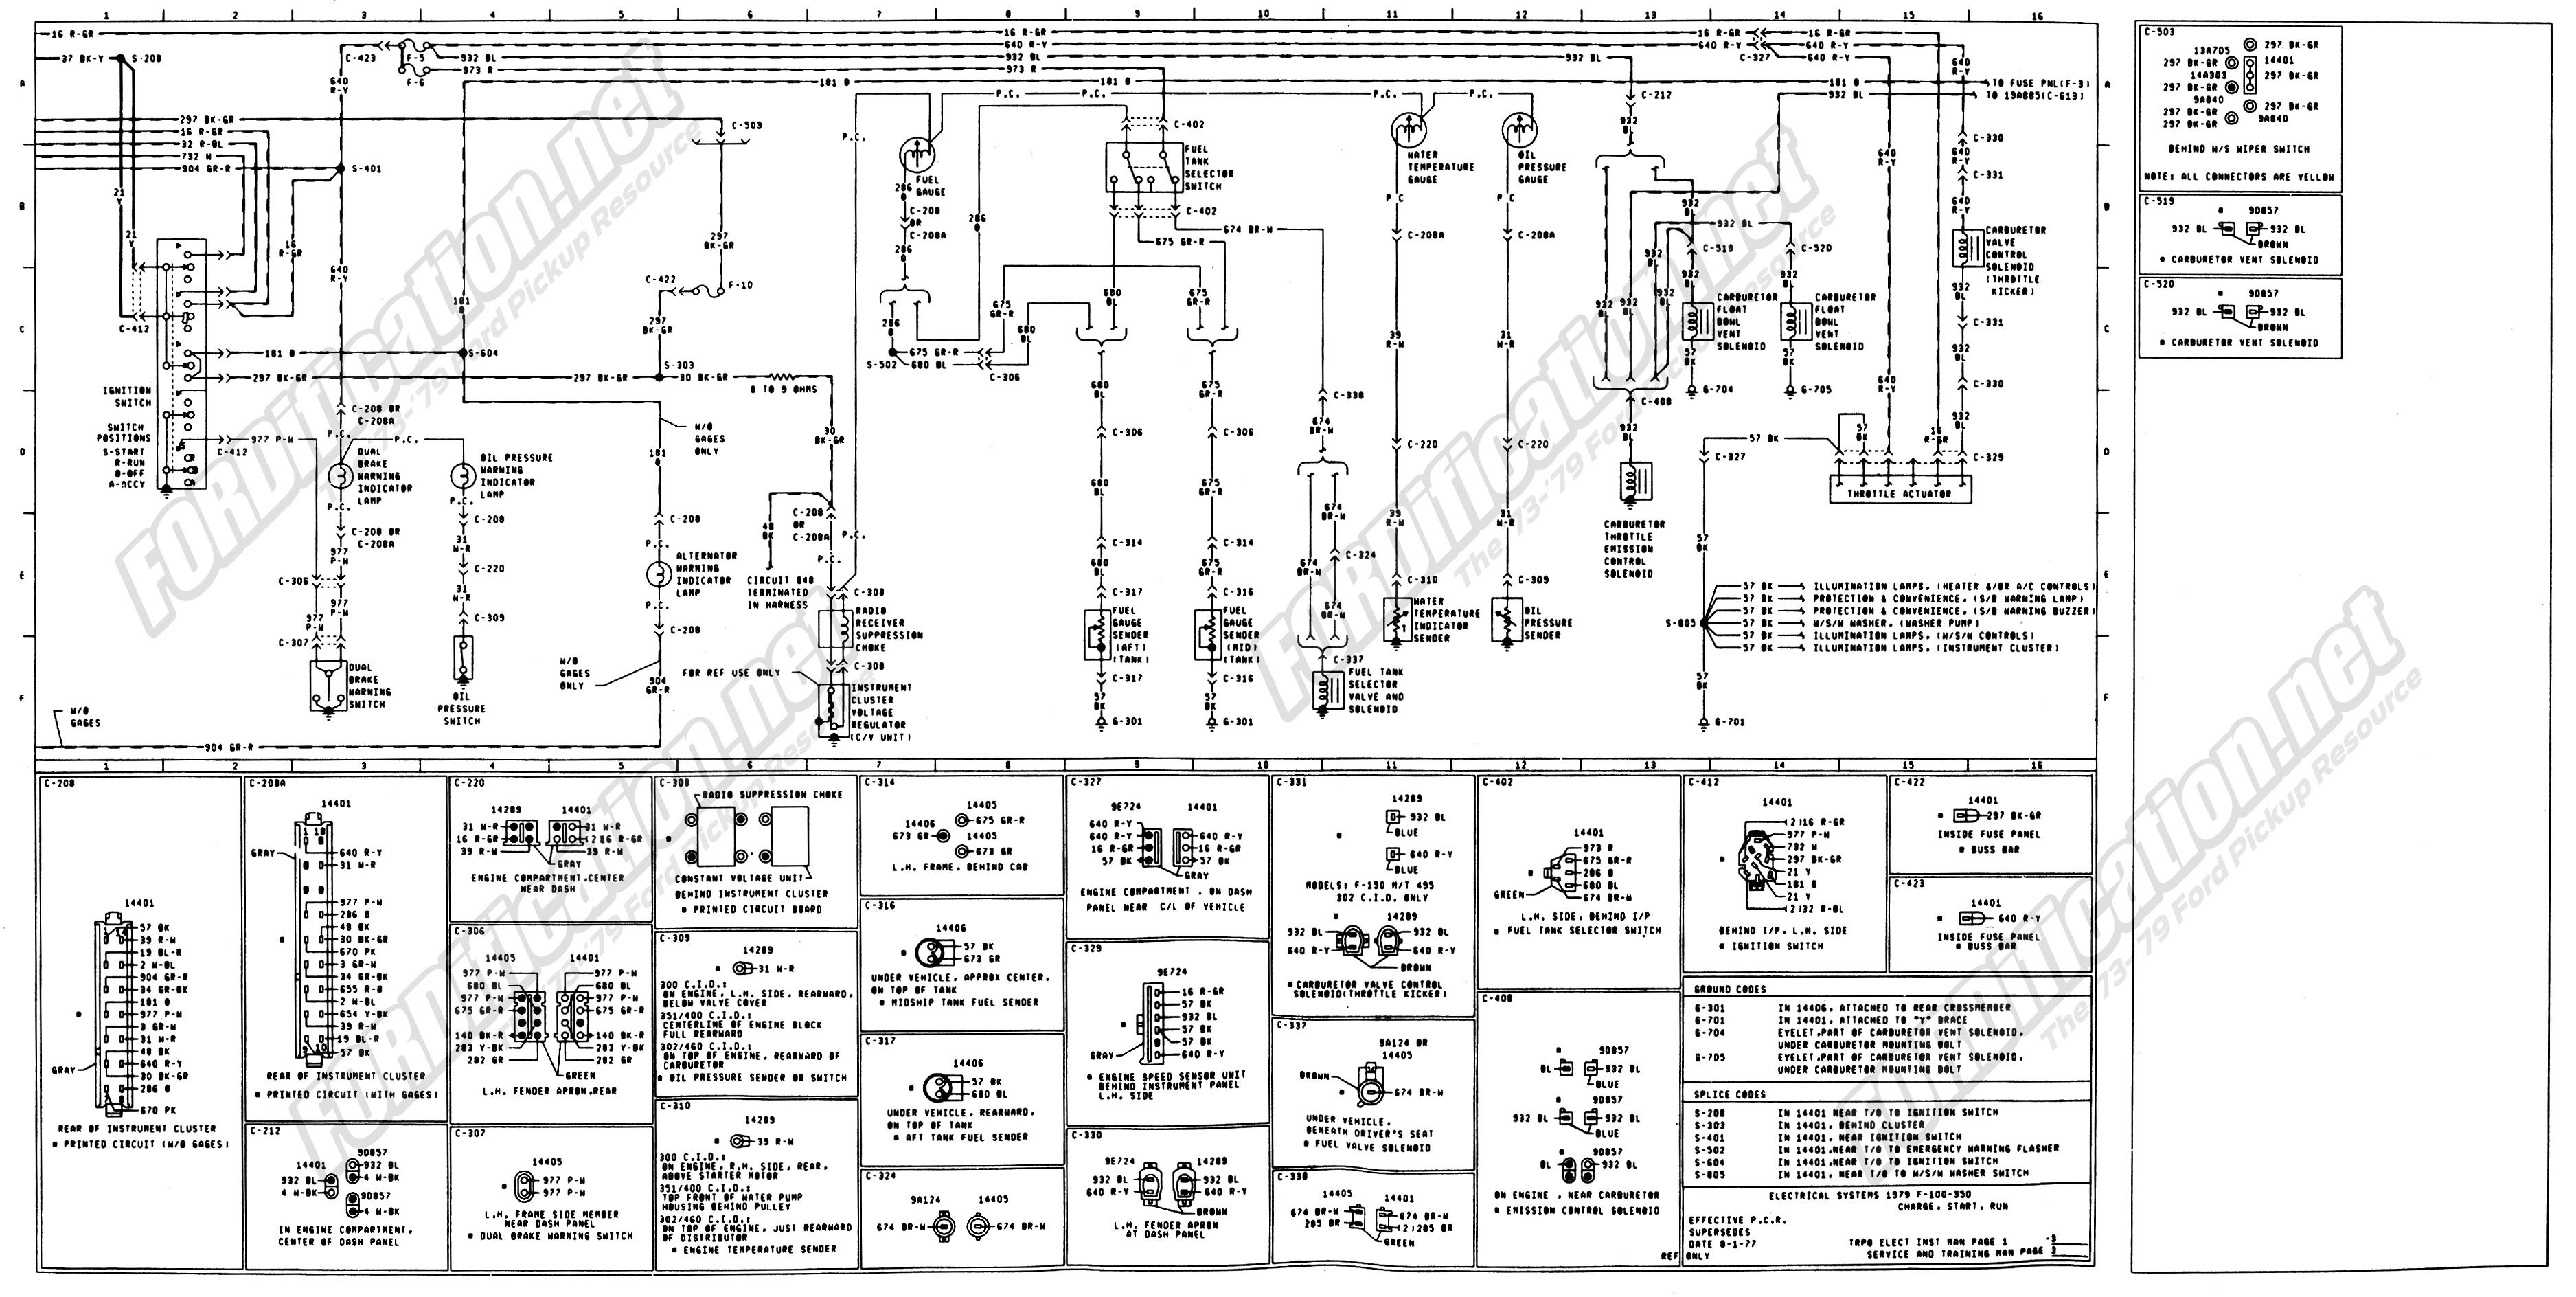 Elegant 2003 Ford F350 Wiring Diagram 52 In Delco Alternator Wiring Diagram with 2003 Ford F350 Wiring Diagram